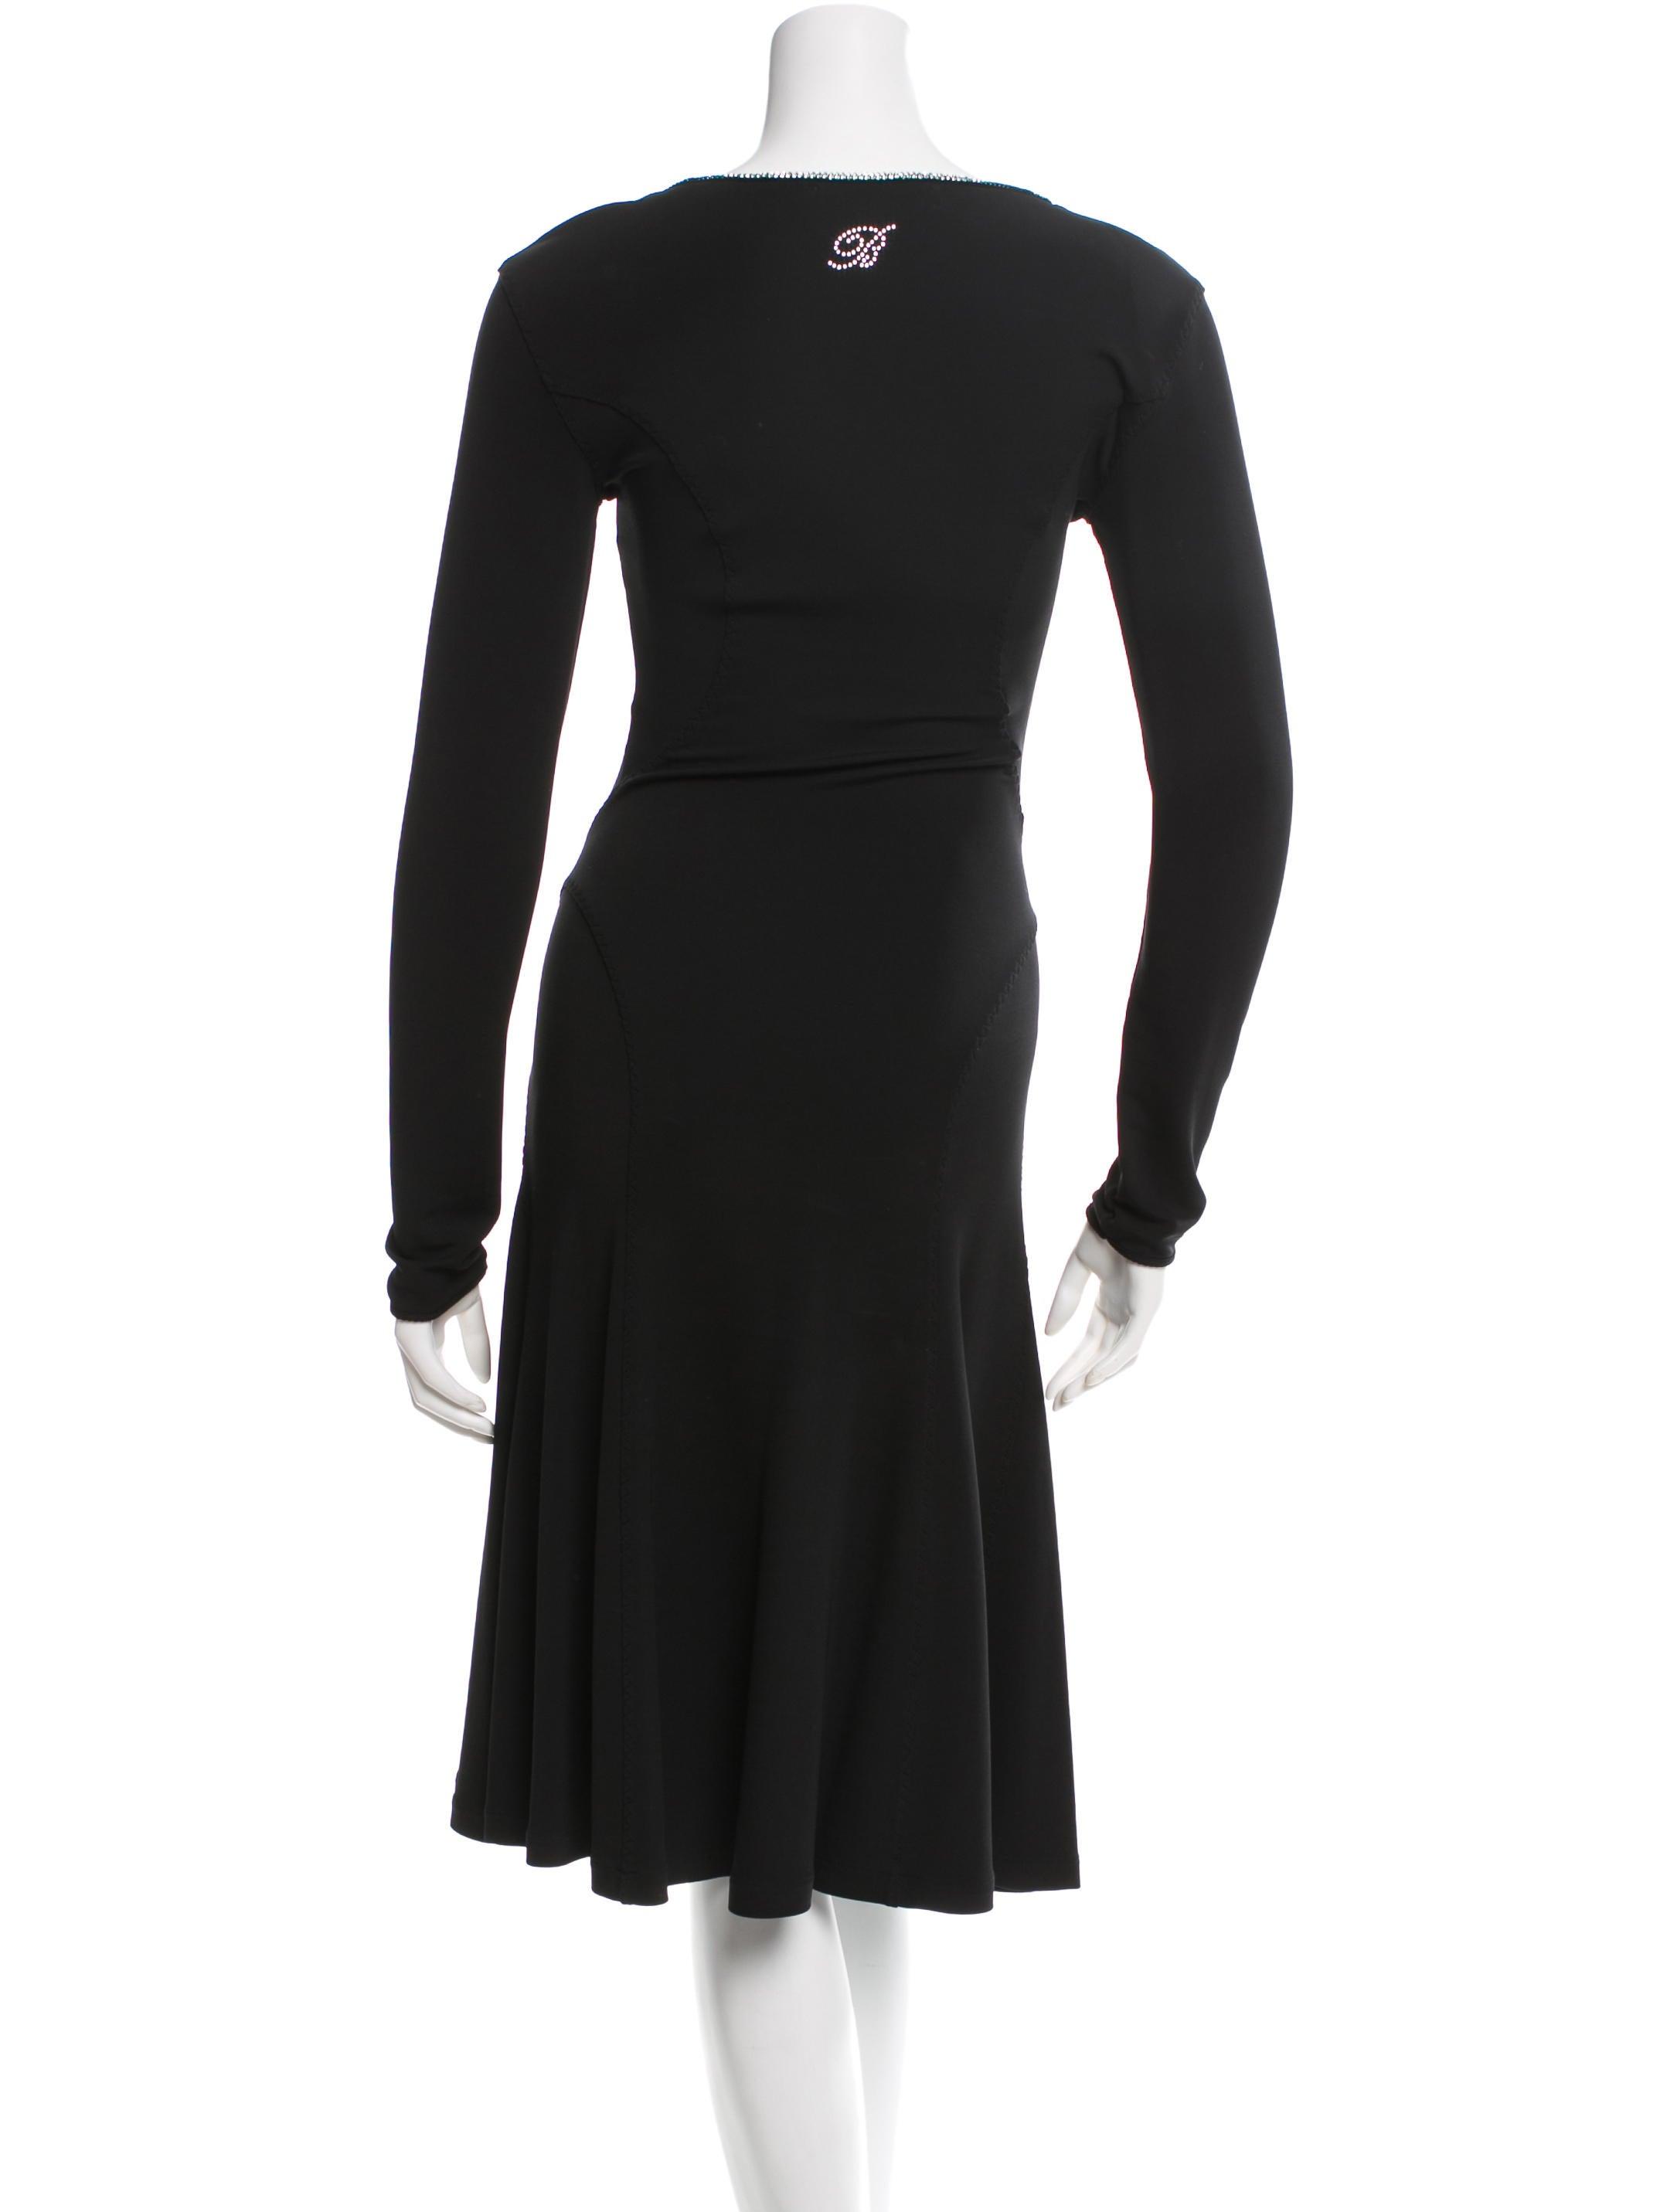 Blumarine A-Line Embellished Dress - Clothing